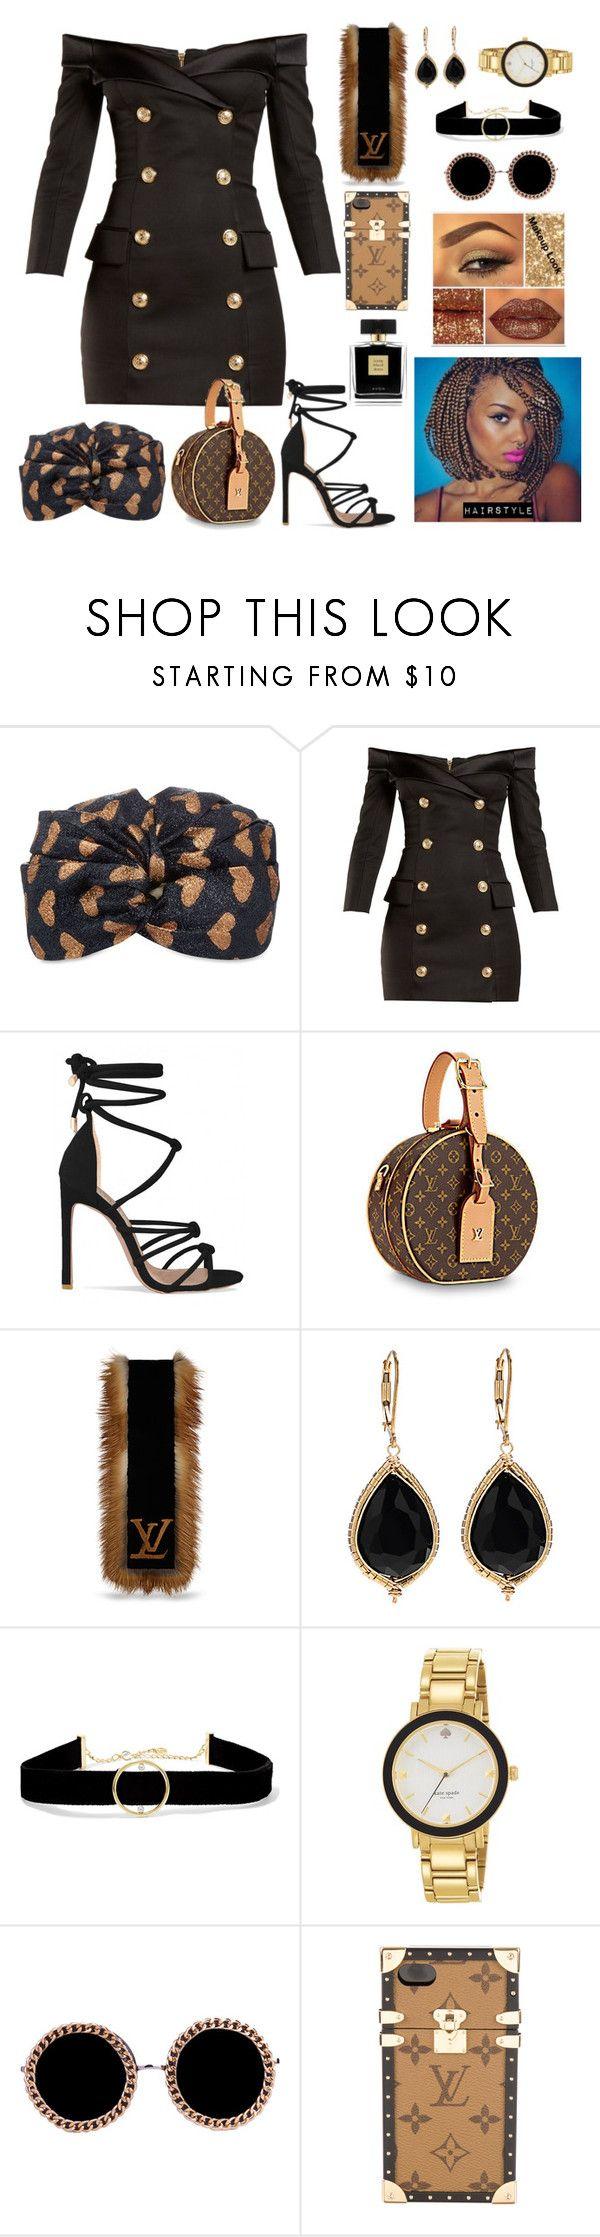 """C'est La Bourgeoisie"" by cissylion ❤ liked on Polyvore featuring Gucci, Balmain, Anissa Kermiche, Kate Spade, Akira, Louis Vuitton and Avon"